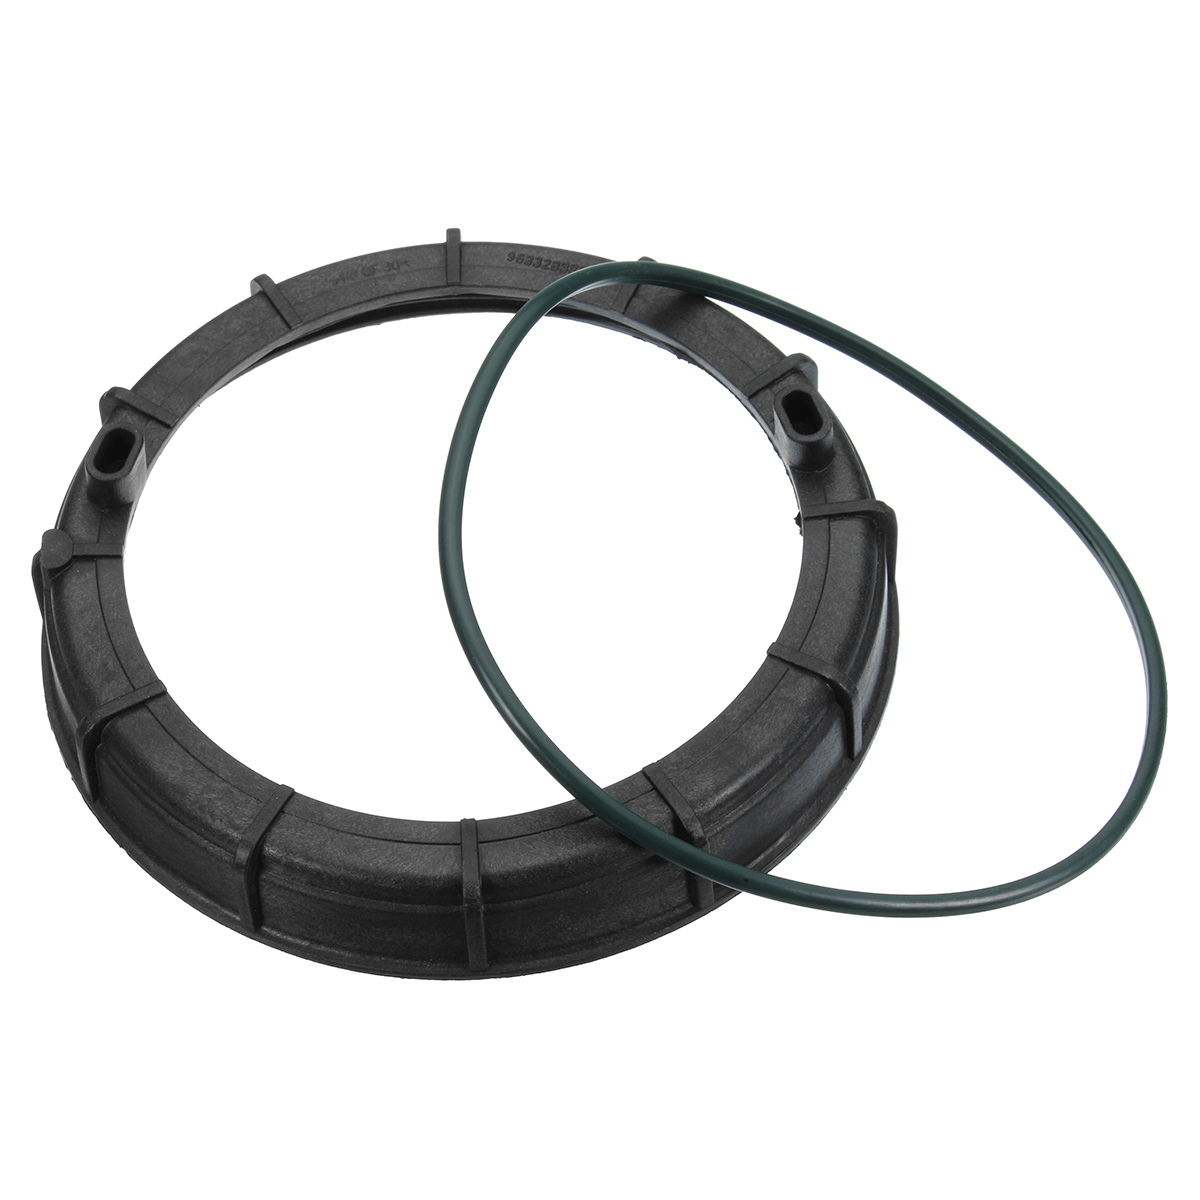 9633283880 Electric Fuel Pump Locking Seal & Cover O Ring For Peugeot 307 206 207 /Sega For Citroen Triumph